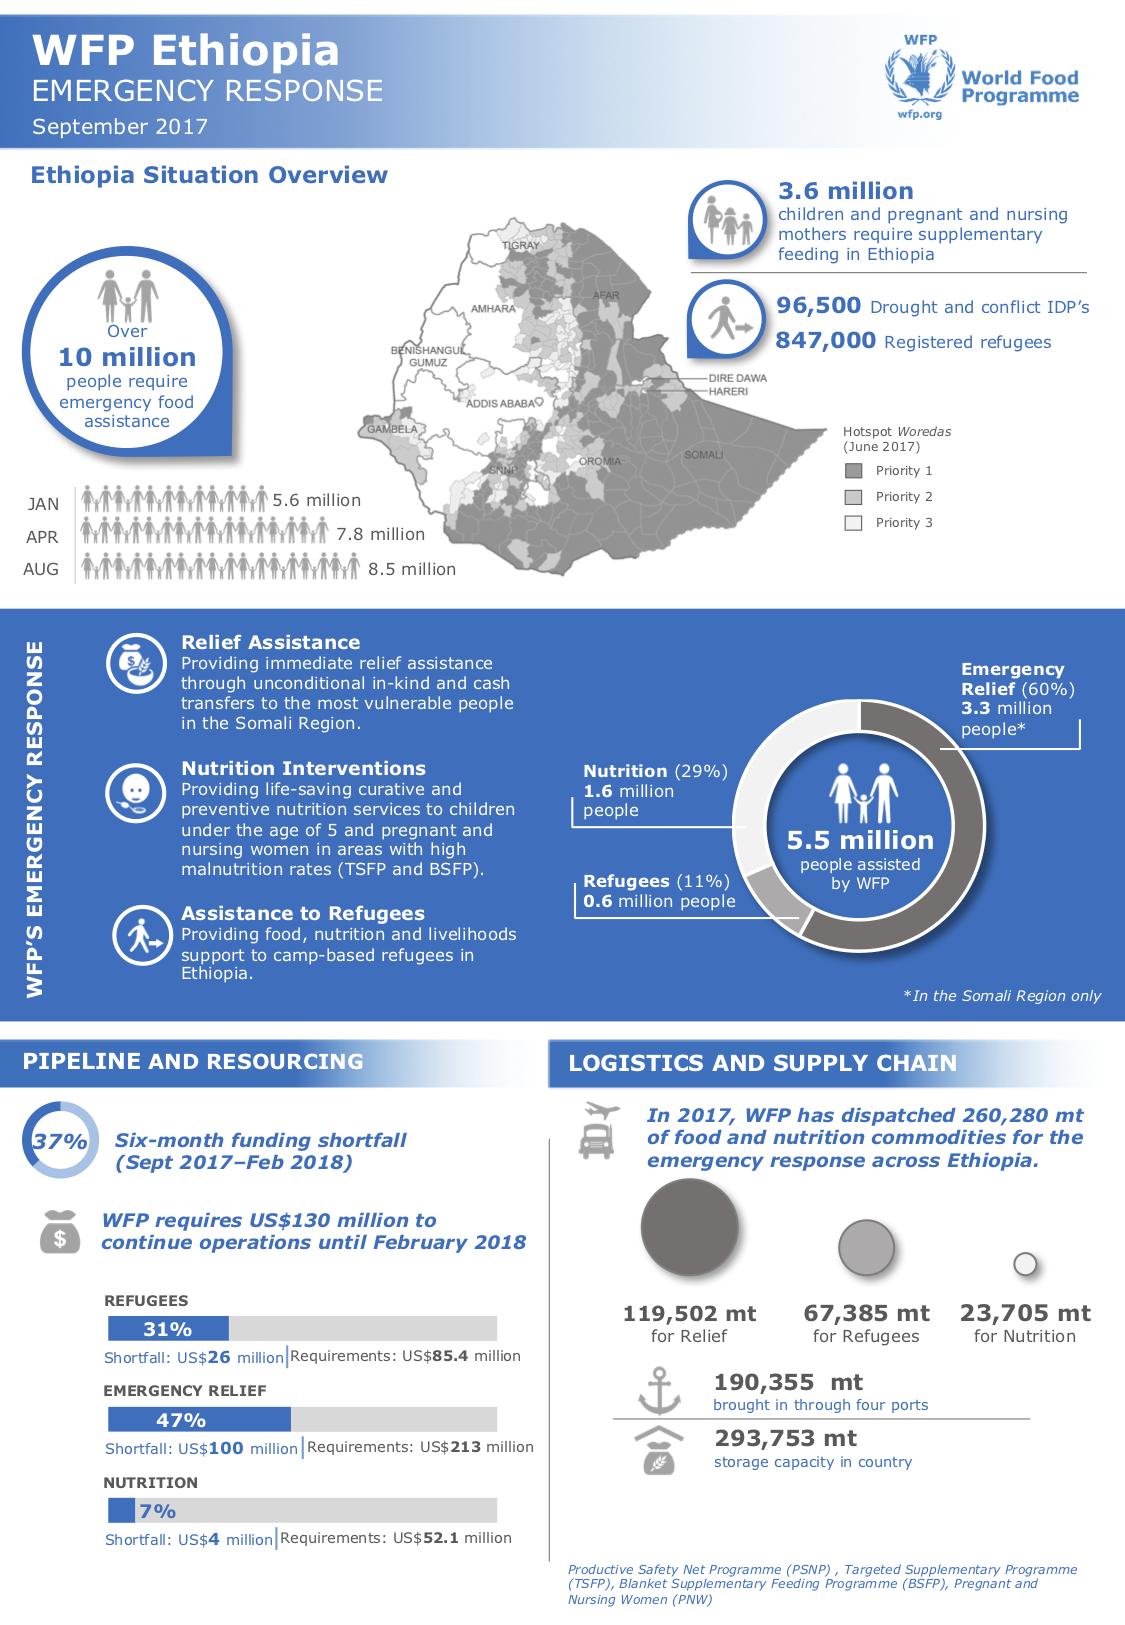 Infographic - 2017 Ethiopia Emergency Response - World Food